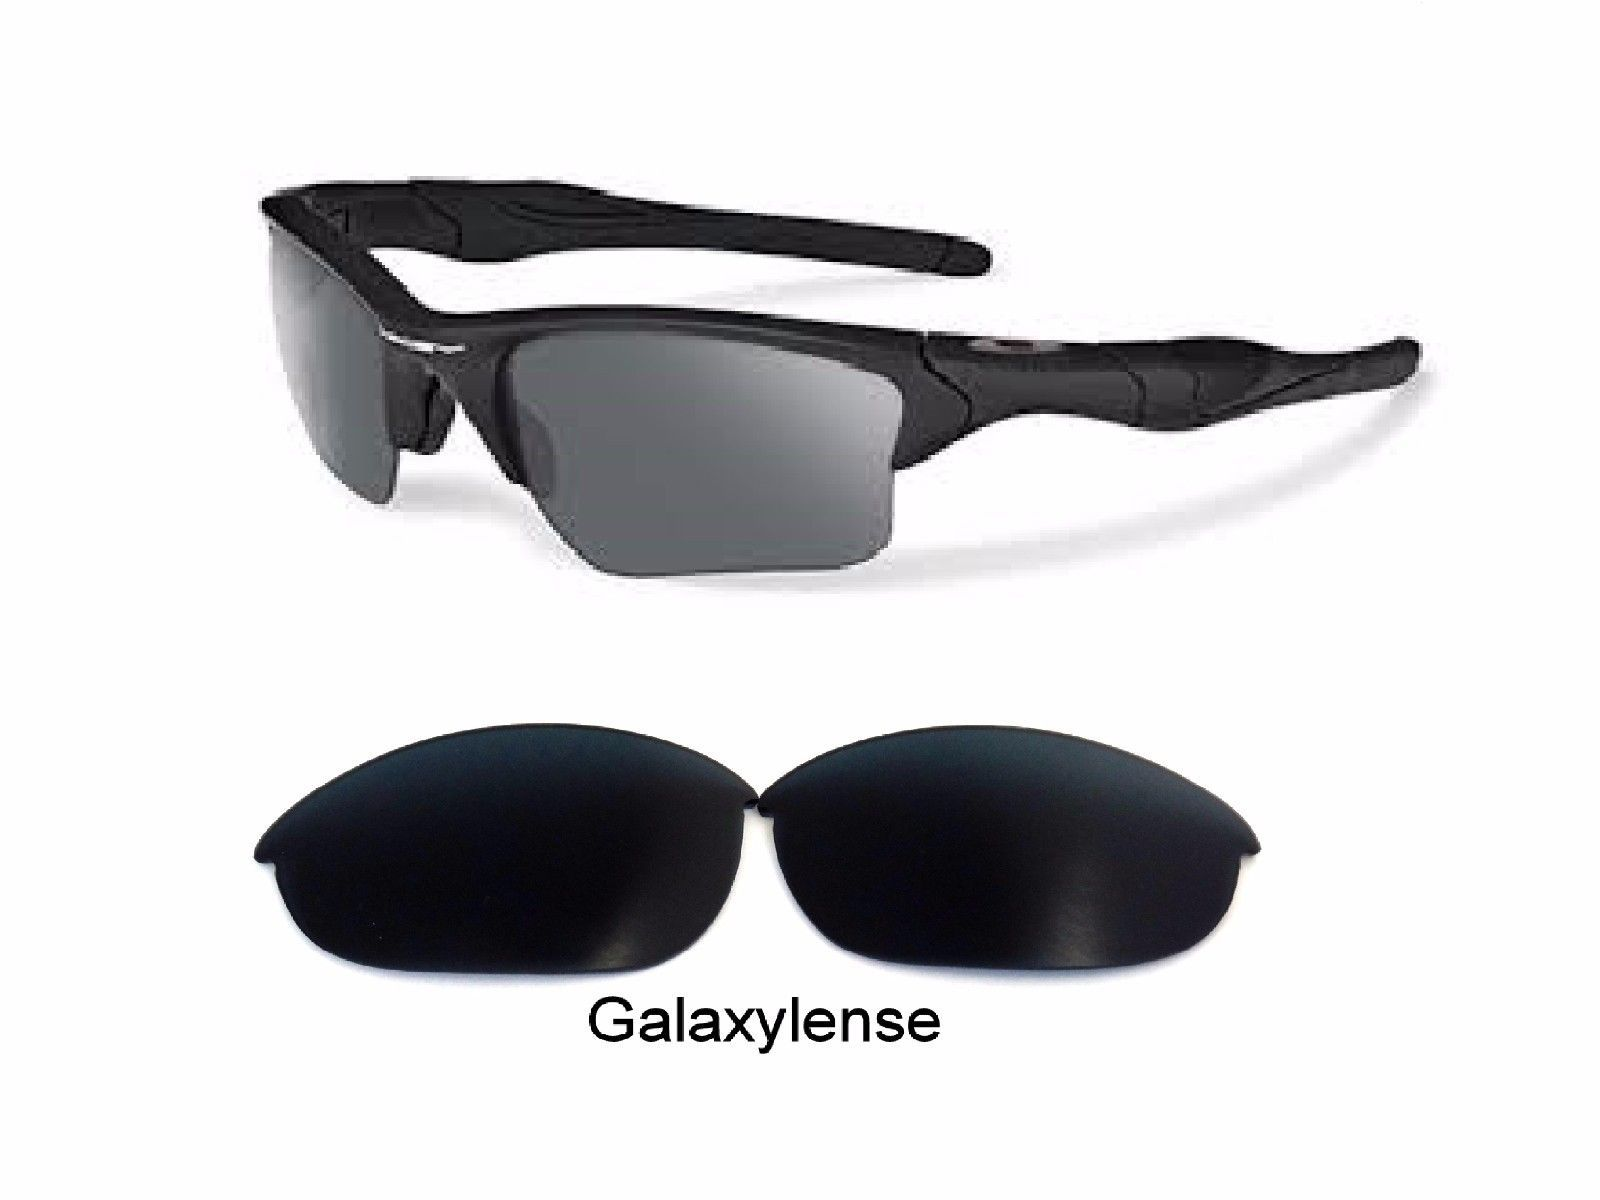 ea5919533e S l1600. S l1600. Previous. Galaxy Replacement Lenses For Oakley Half  Jacket 2.0 Sunglasses Iridium Black · Galaxy Replacement ...